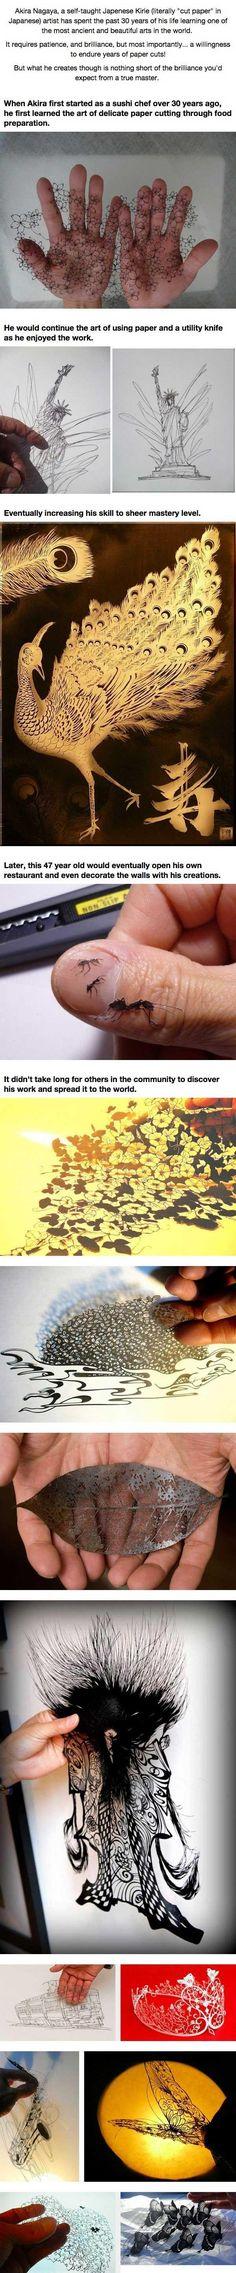 Not Anime but still amazing Japanese art - Paper art by Akira Nagaya - my goodness, look at that leaf!?